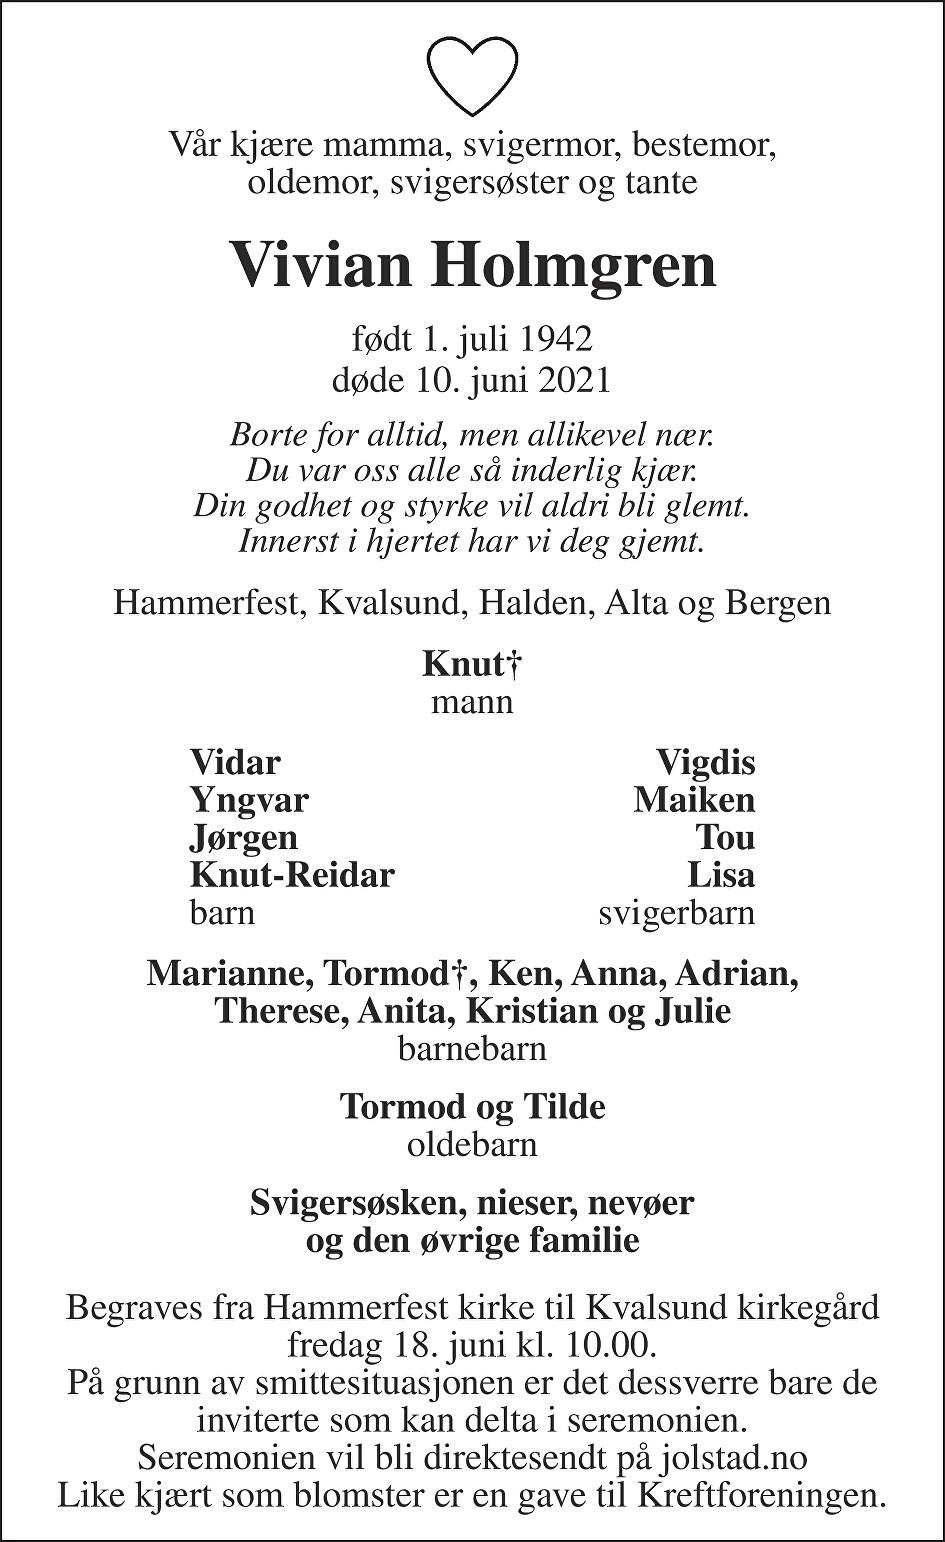 Vivian Holmgren Dødsannonse